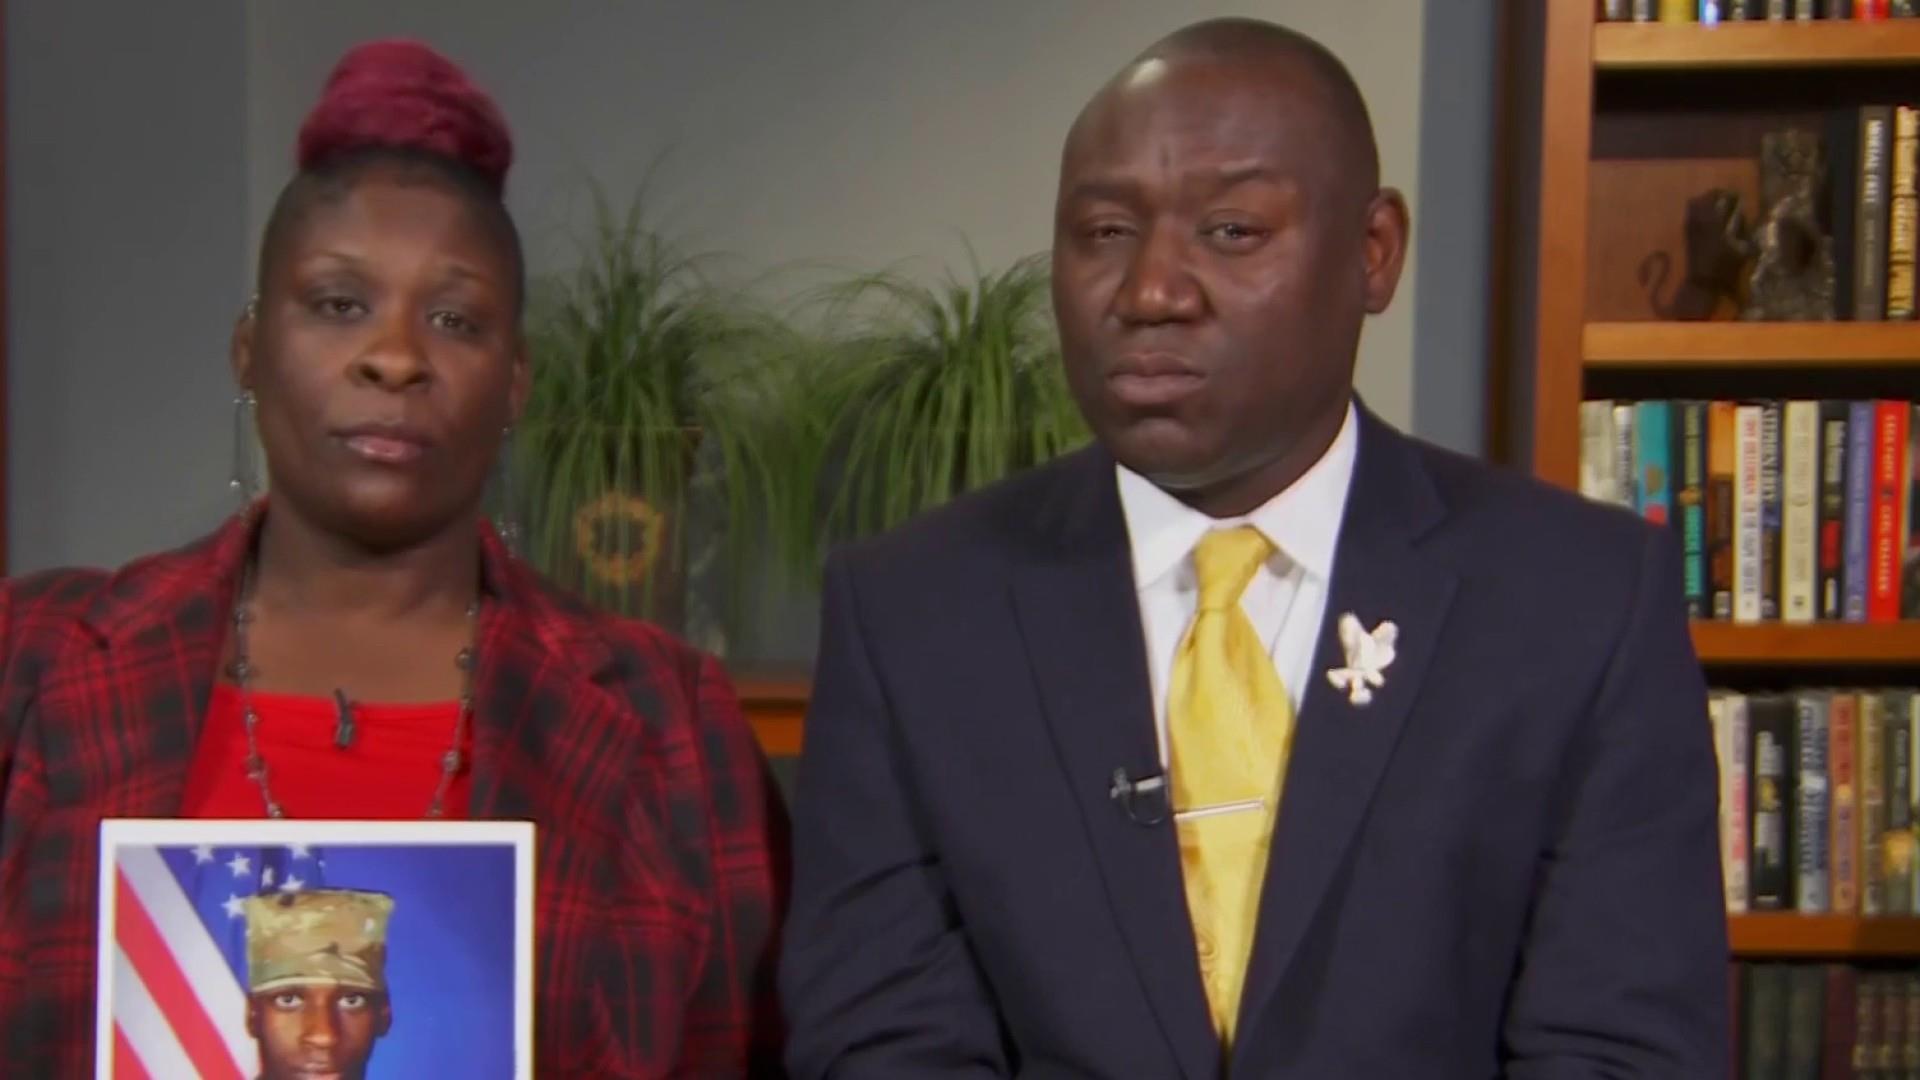 E.J. Bradford's family calls for release of police video